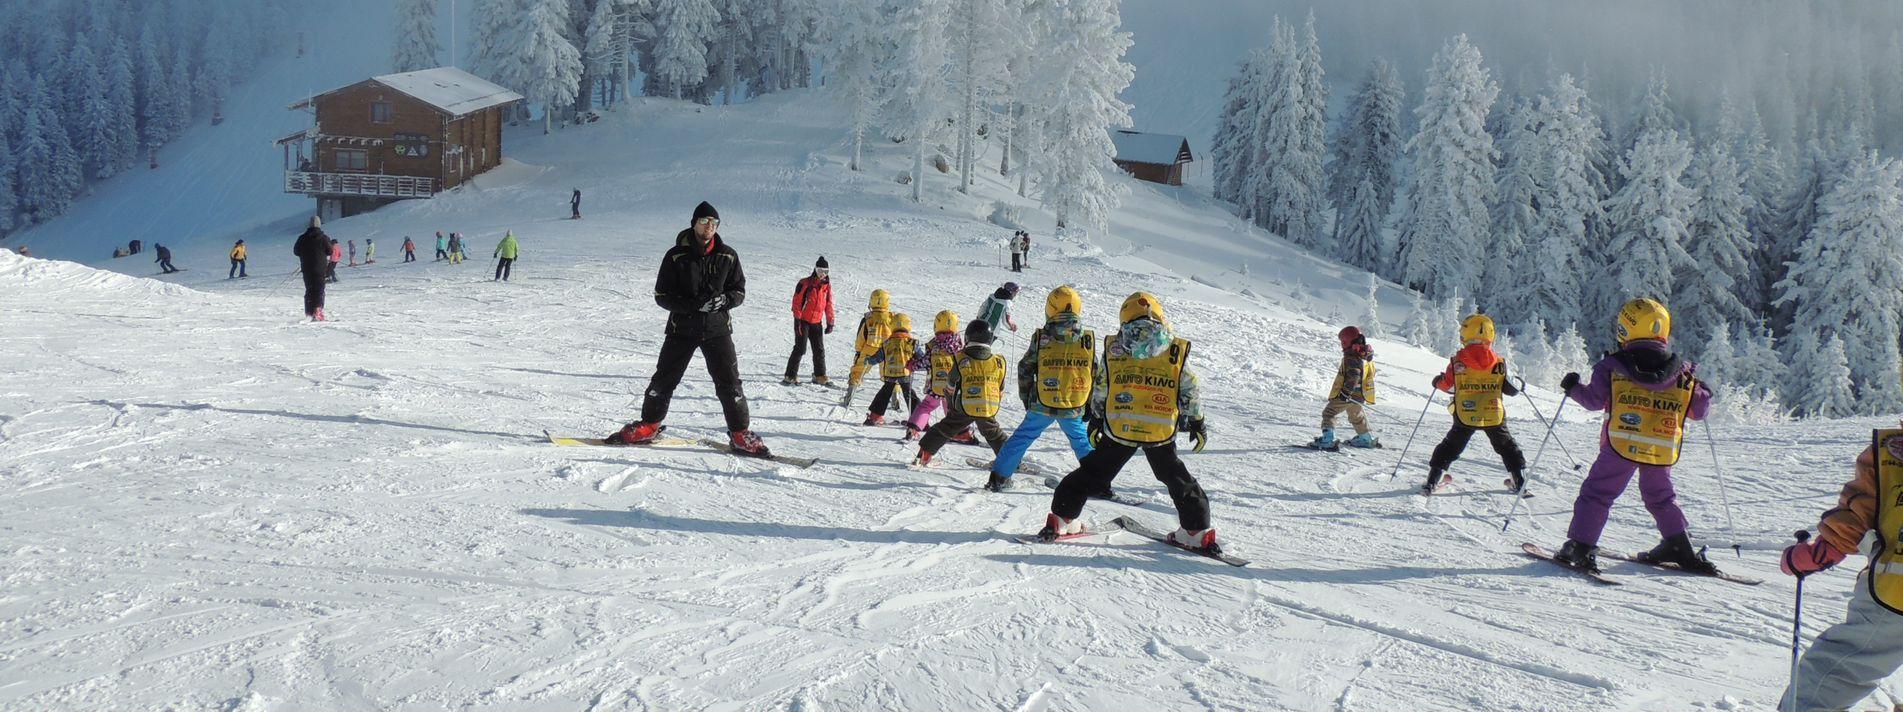 Cursuri colective schi pentru incepatori | Piticii zapezii | Sport Ski Club